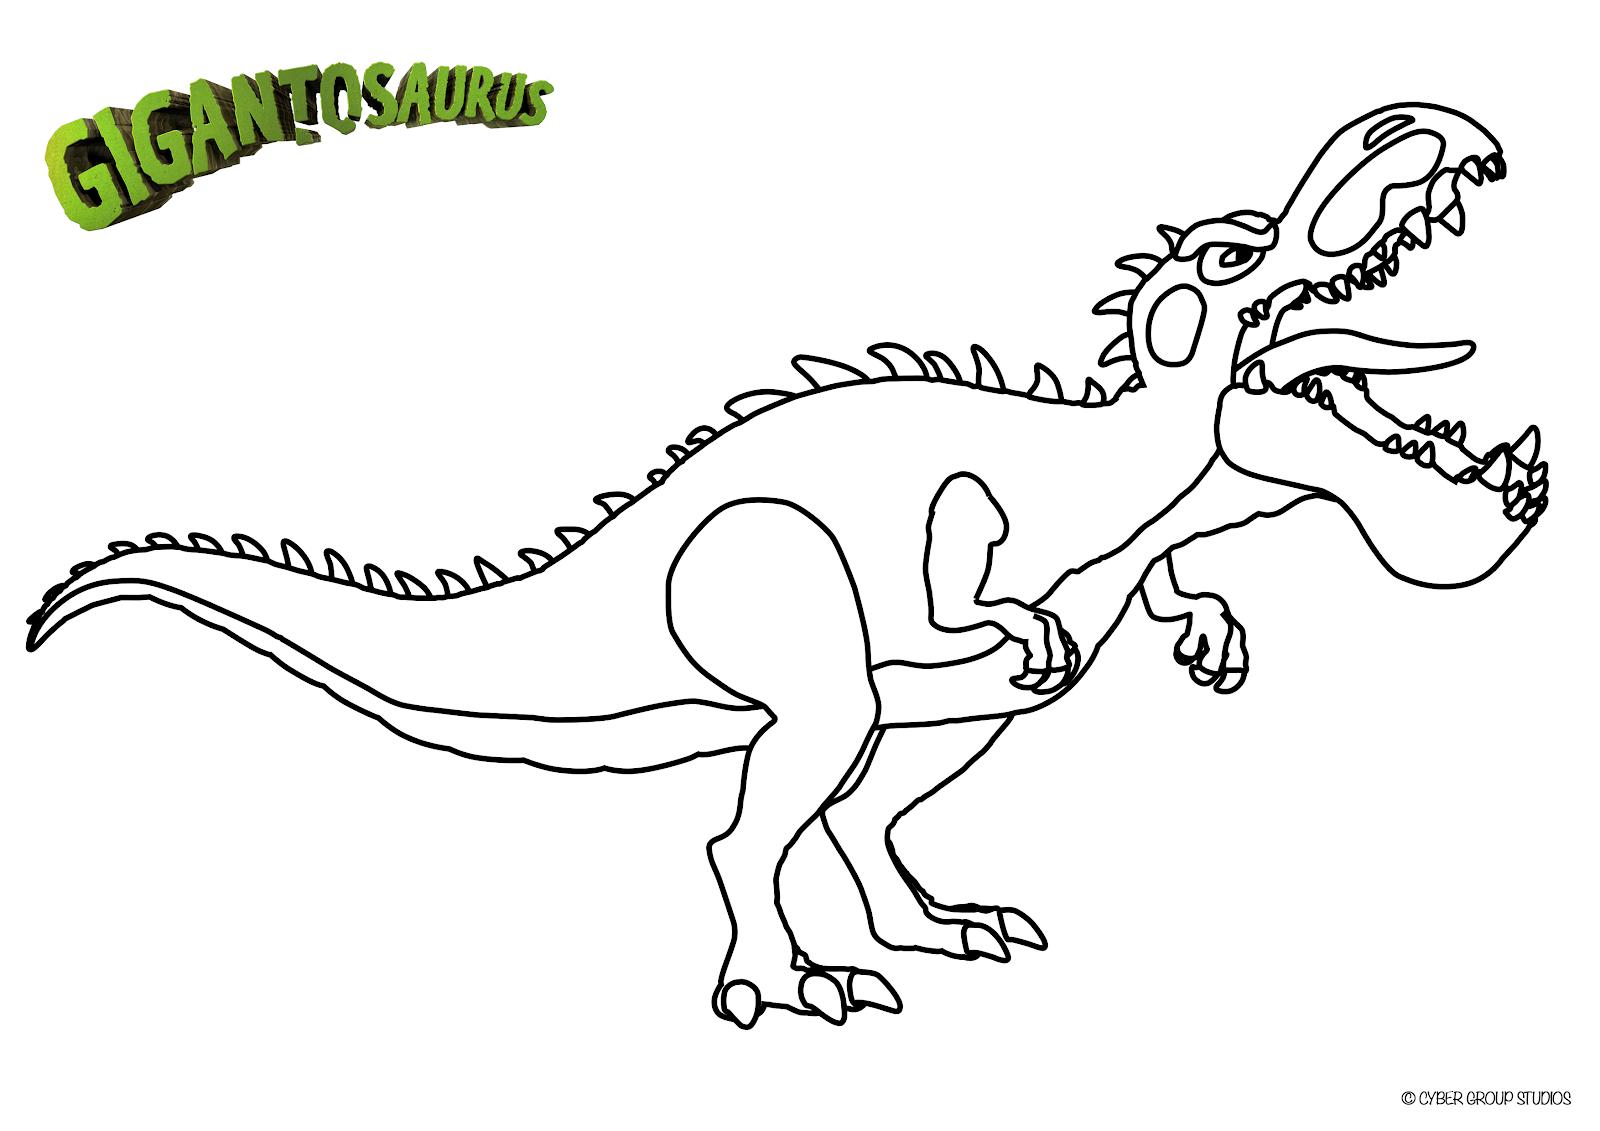 Gigantosaurus Brings Preschoolers Prehistoric Life Lessons On